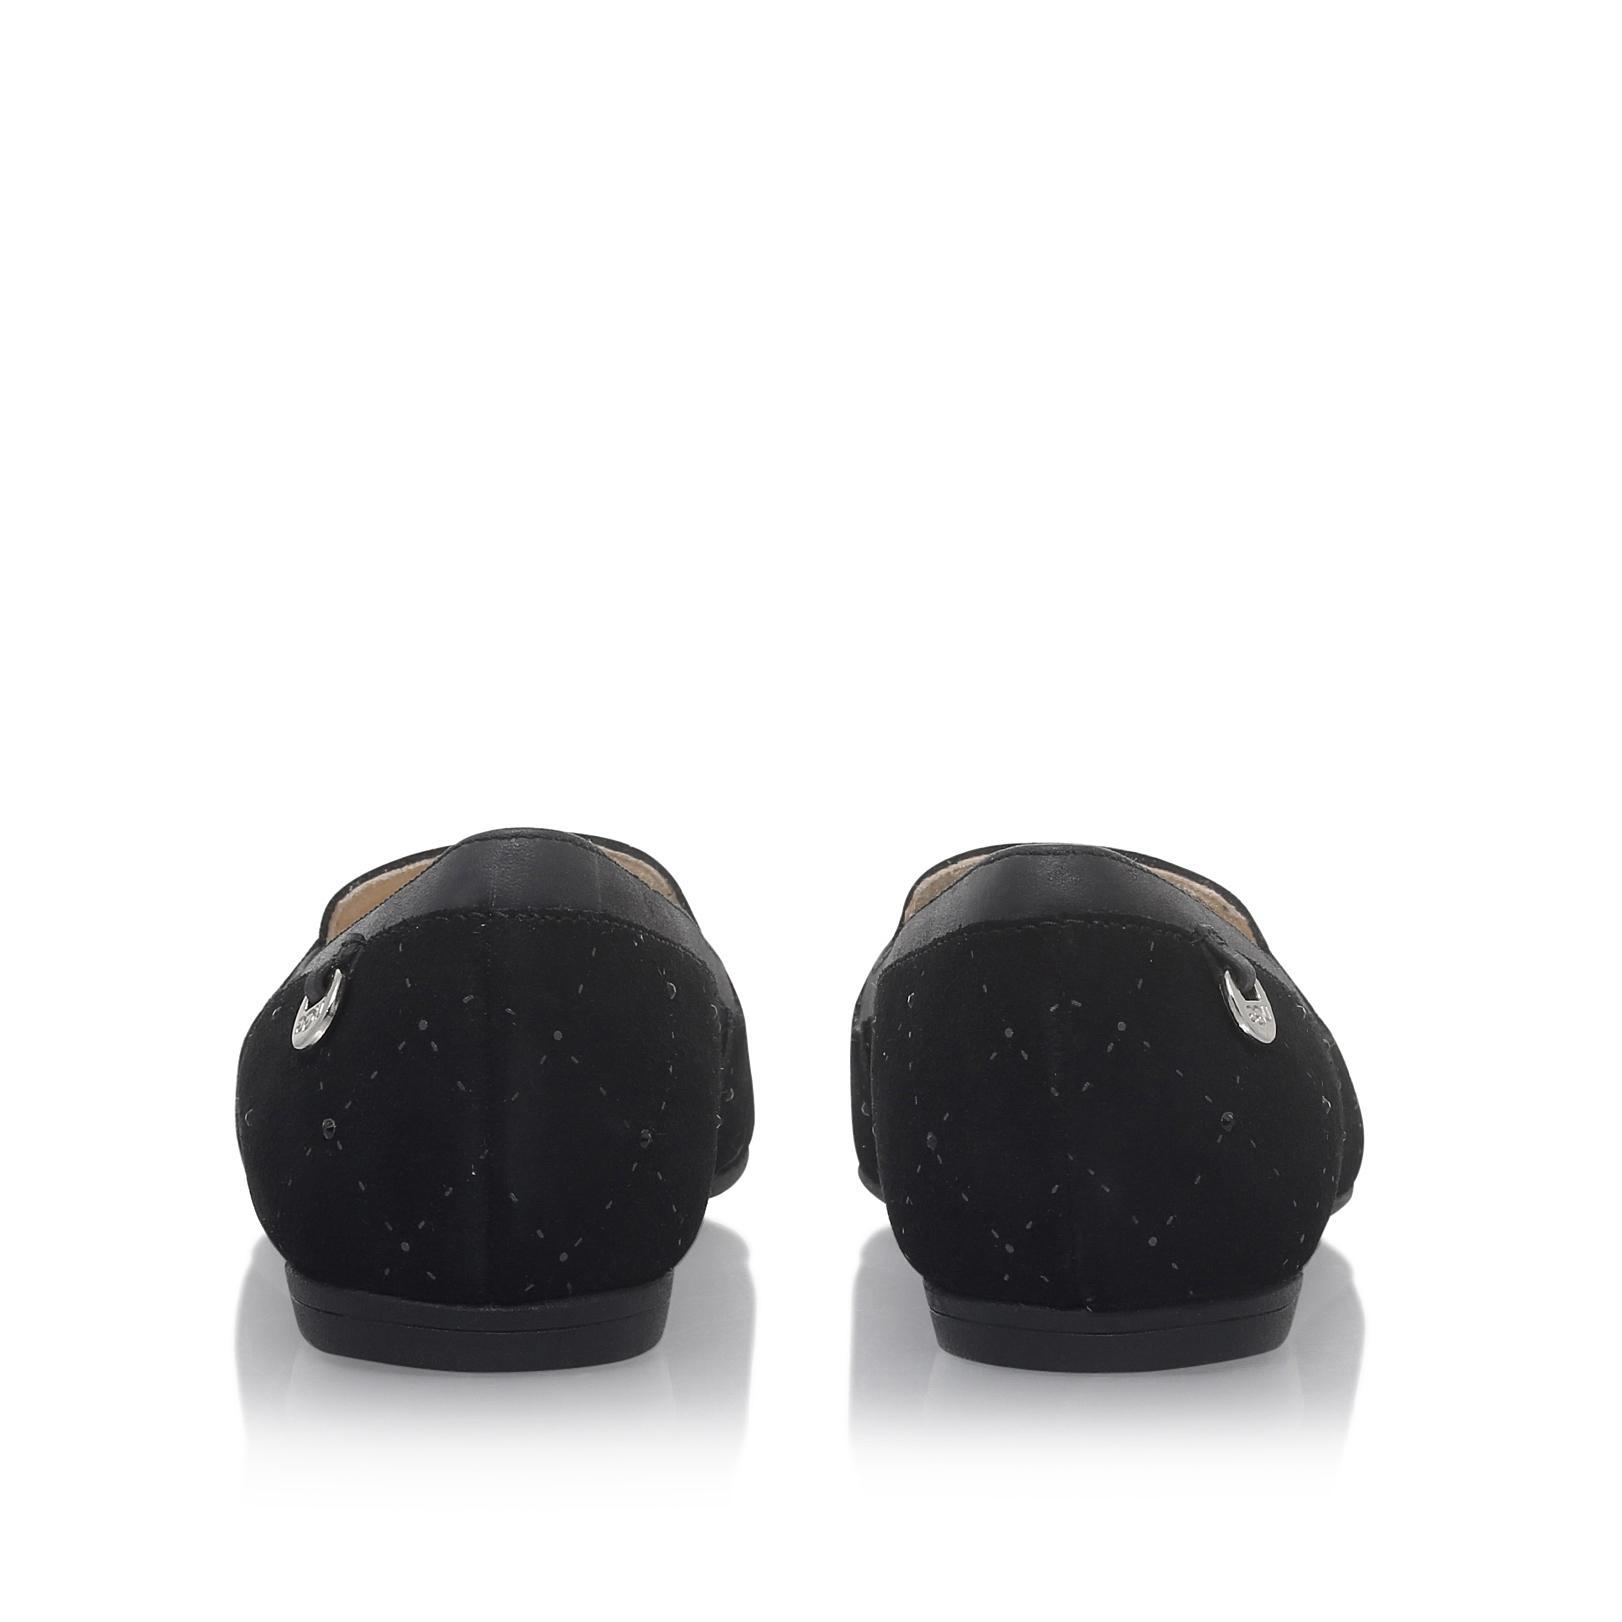 cc3ca048e60 Ugg Bentlie Diamond Quilt in Black - Lyst